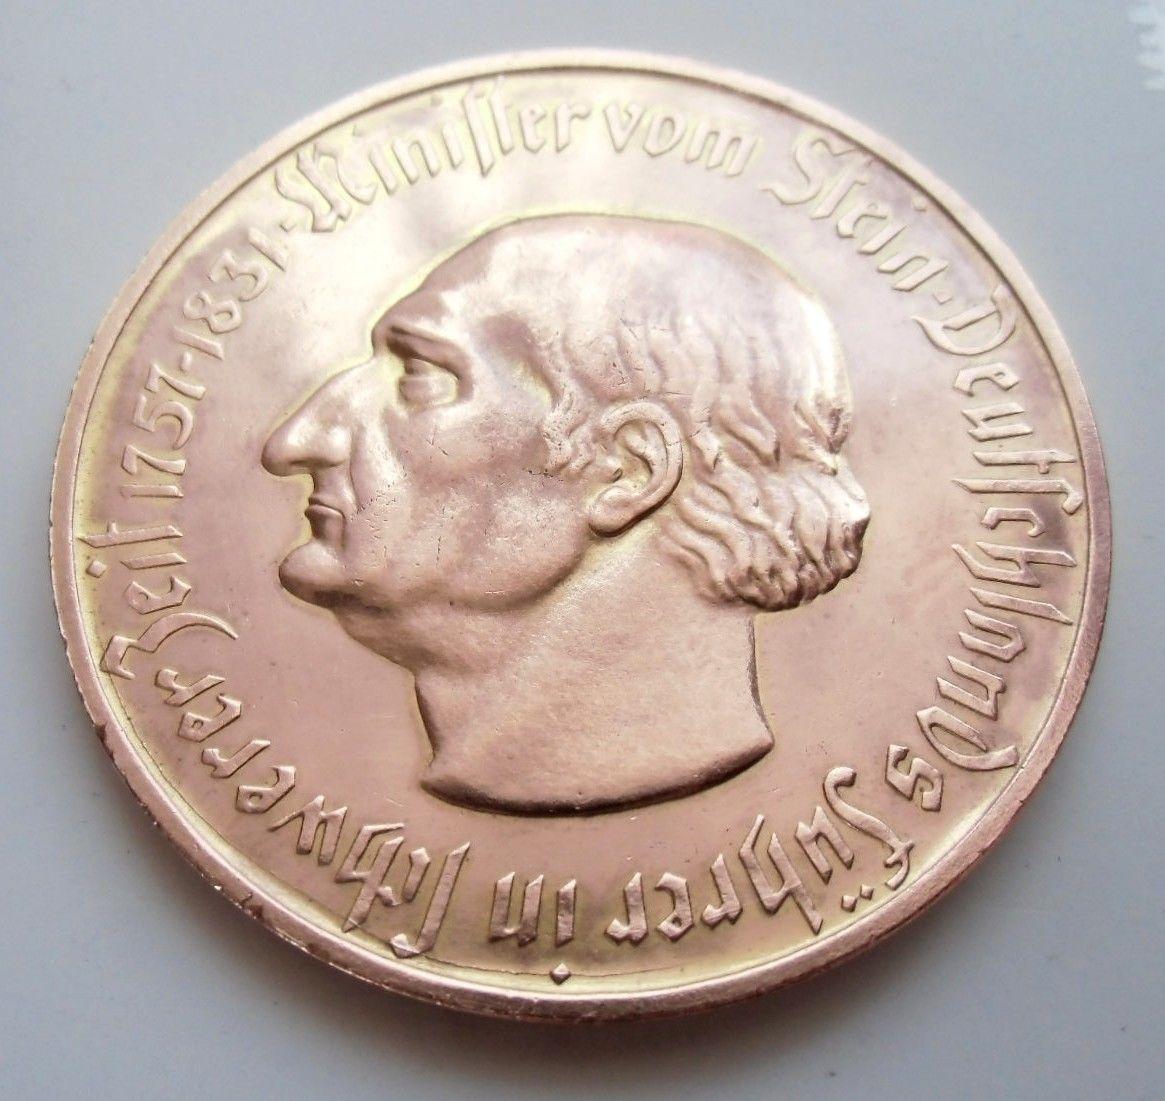 Monedas de emergencia emitidas por el banco regional de Westphalia 1923_5ma